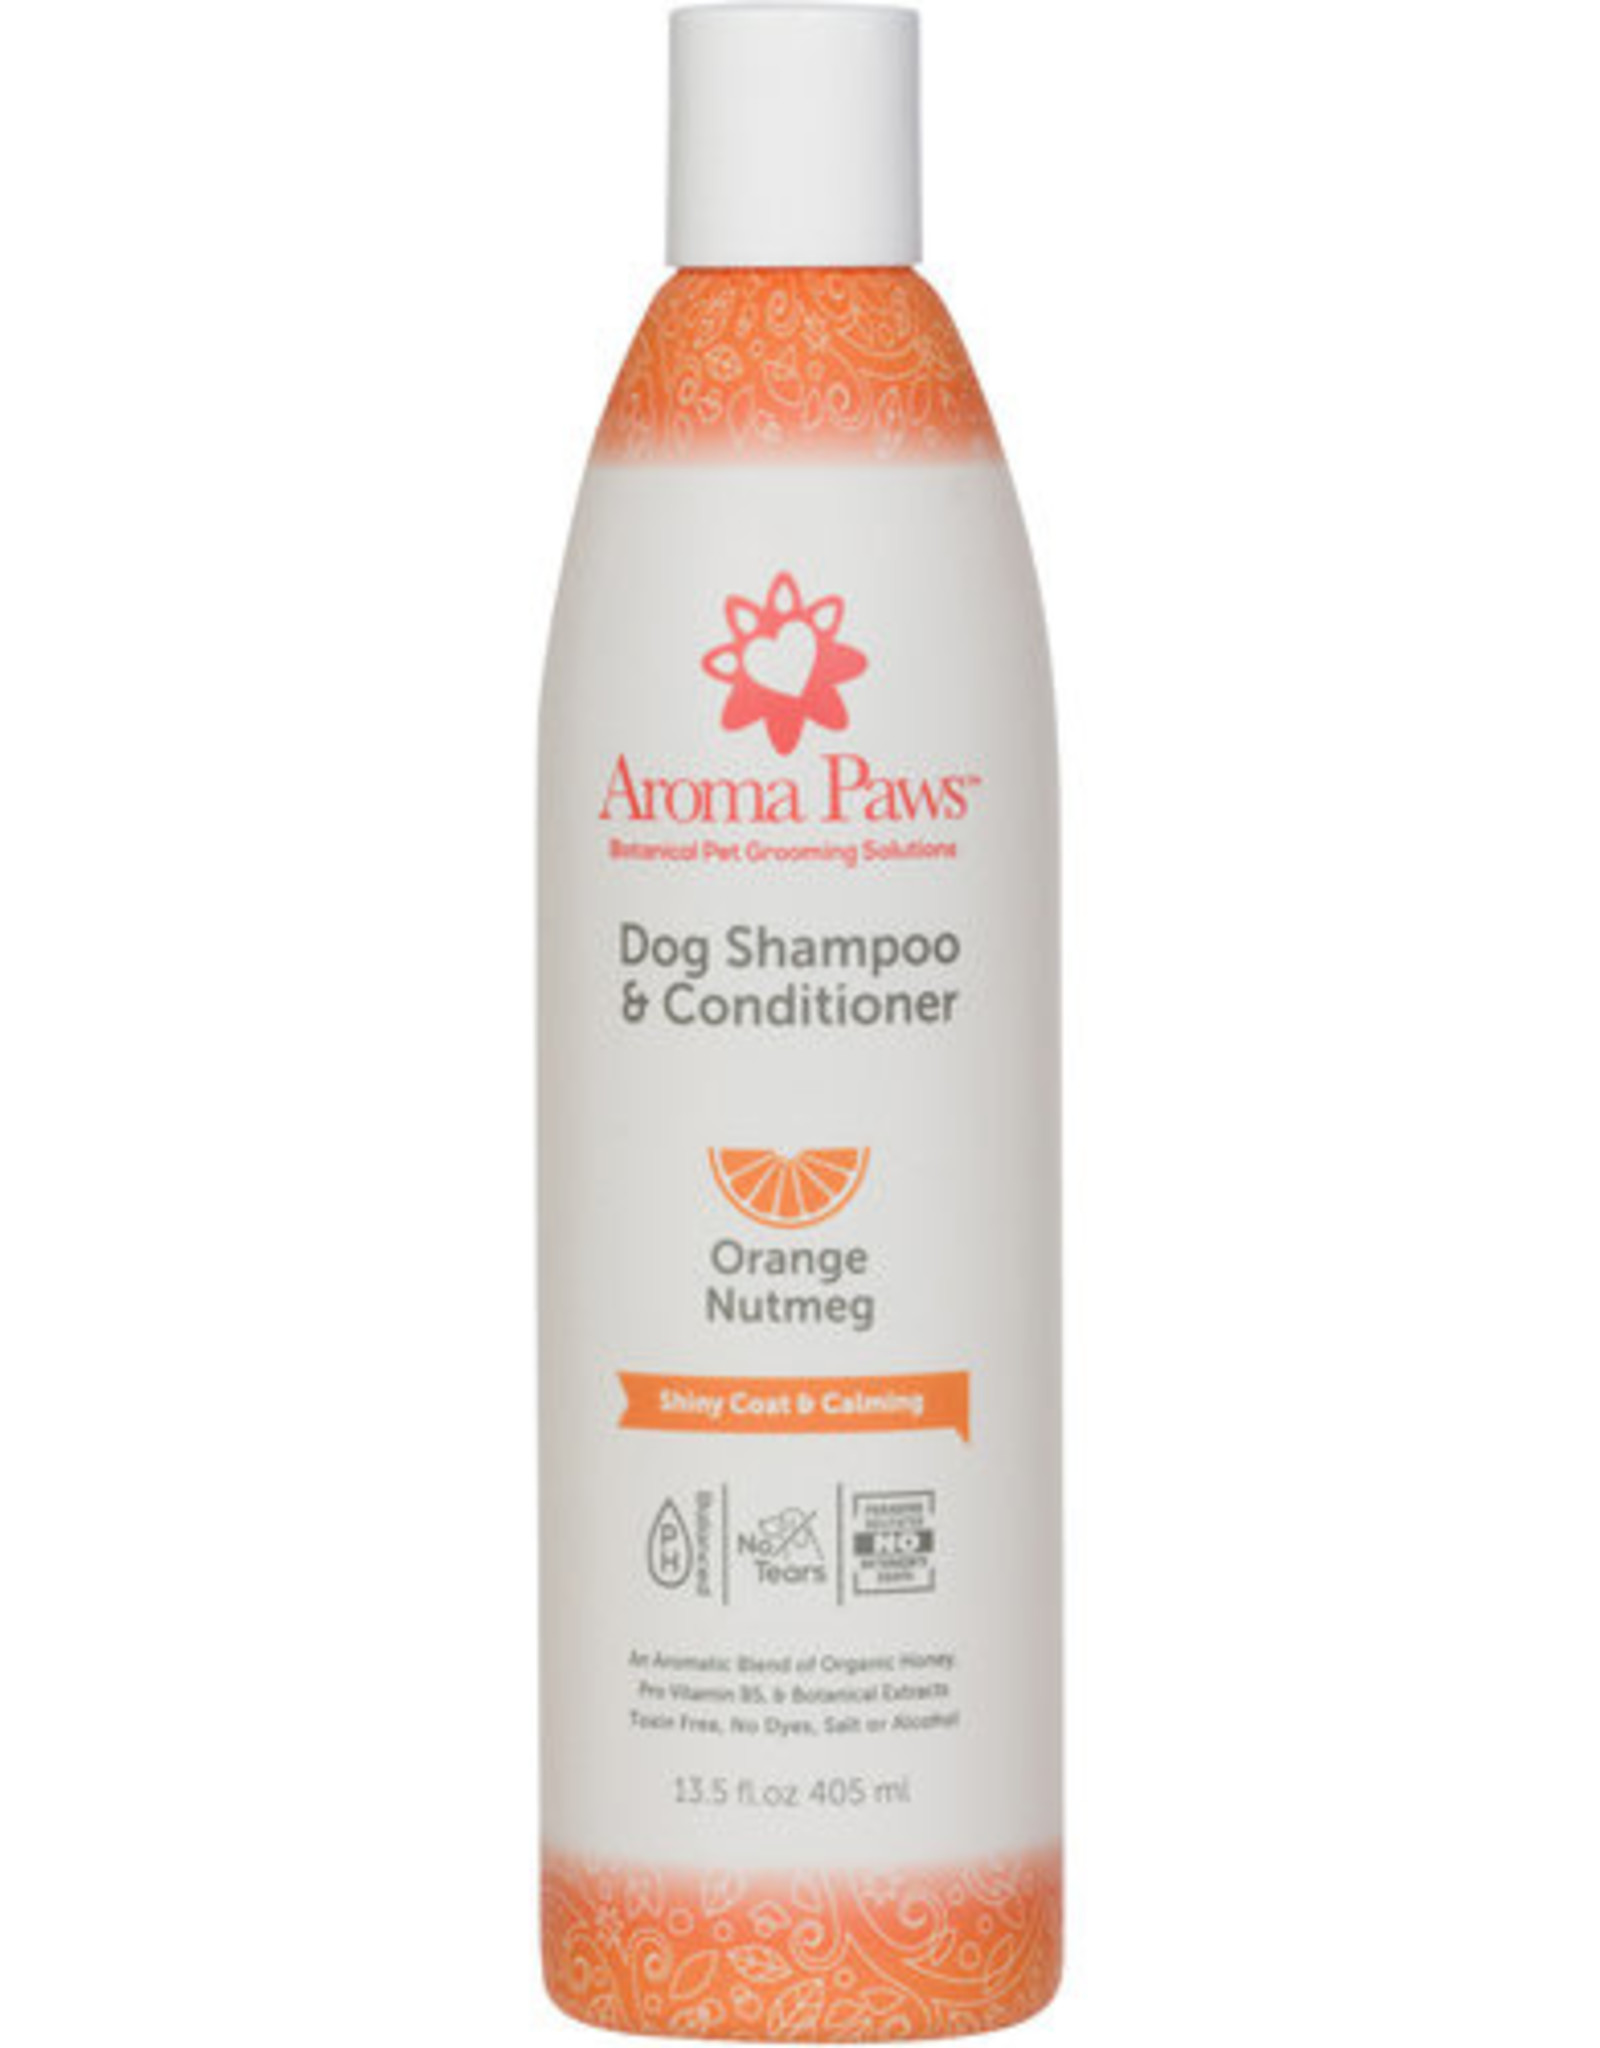 Aroma Paws Shampoo - Orange